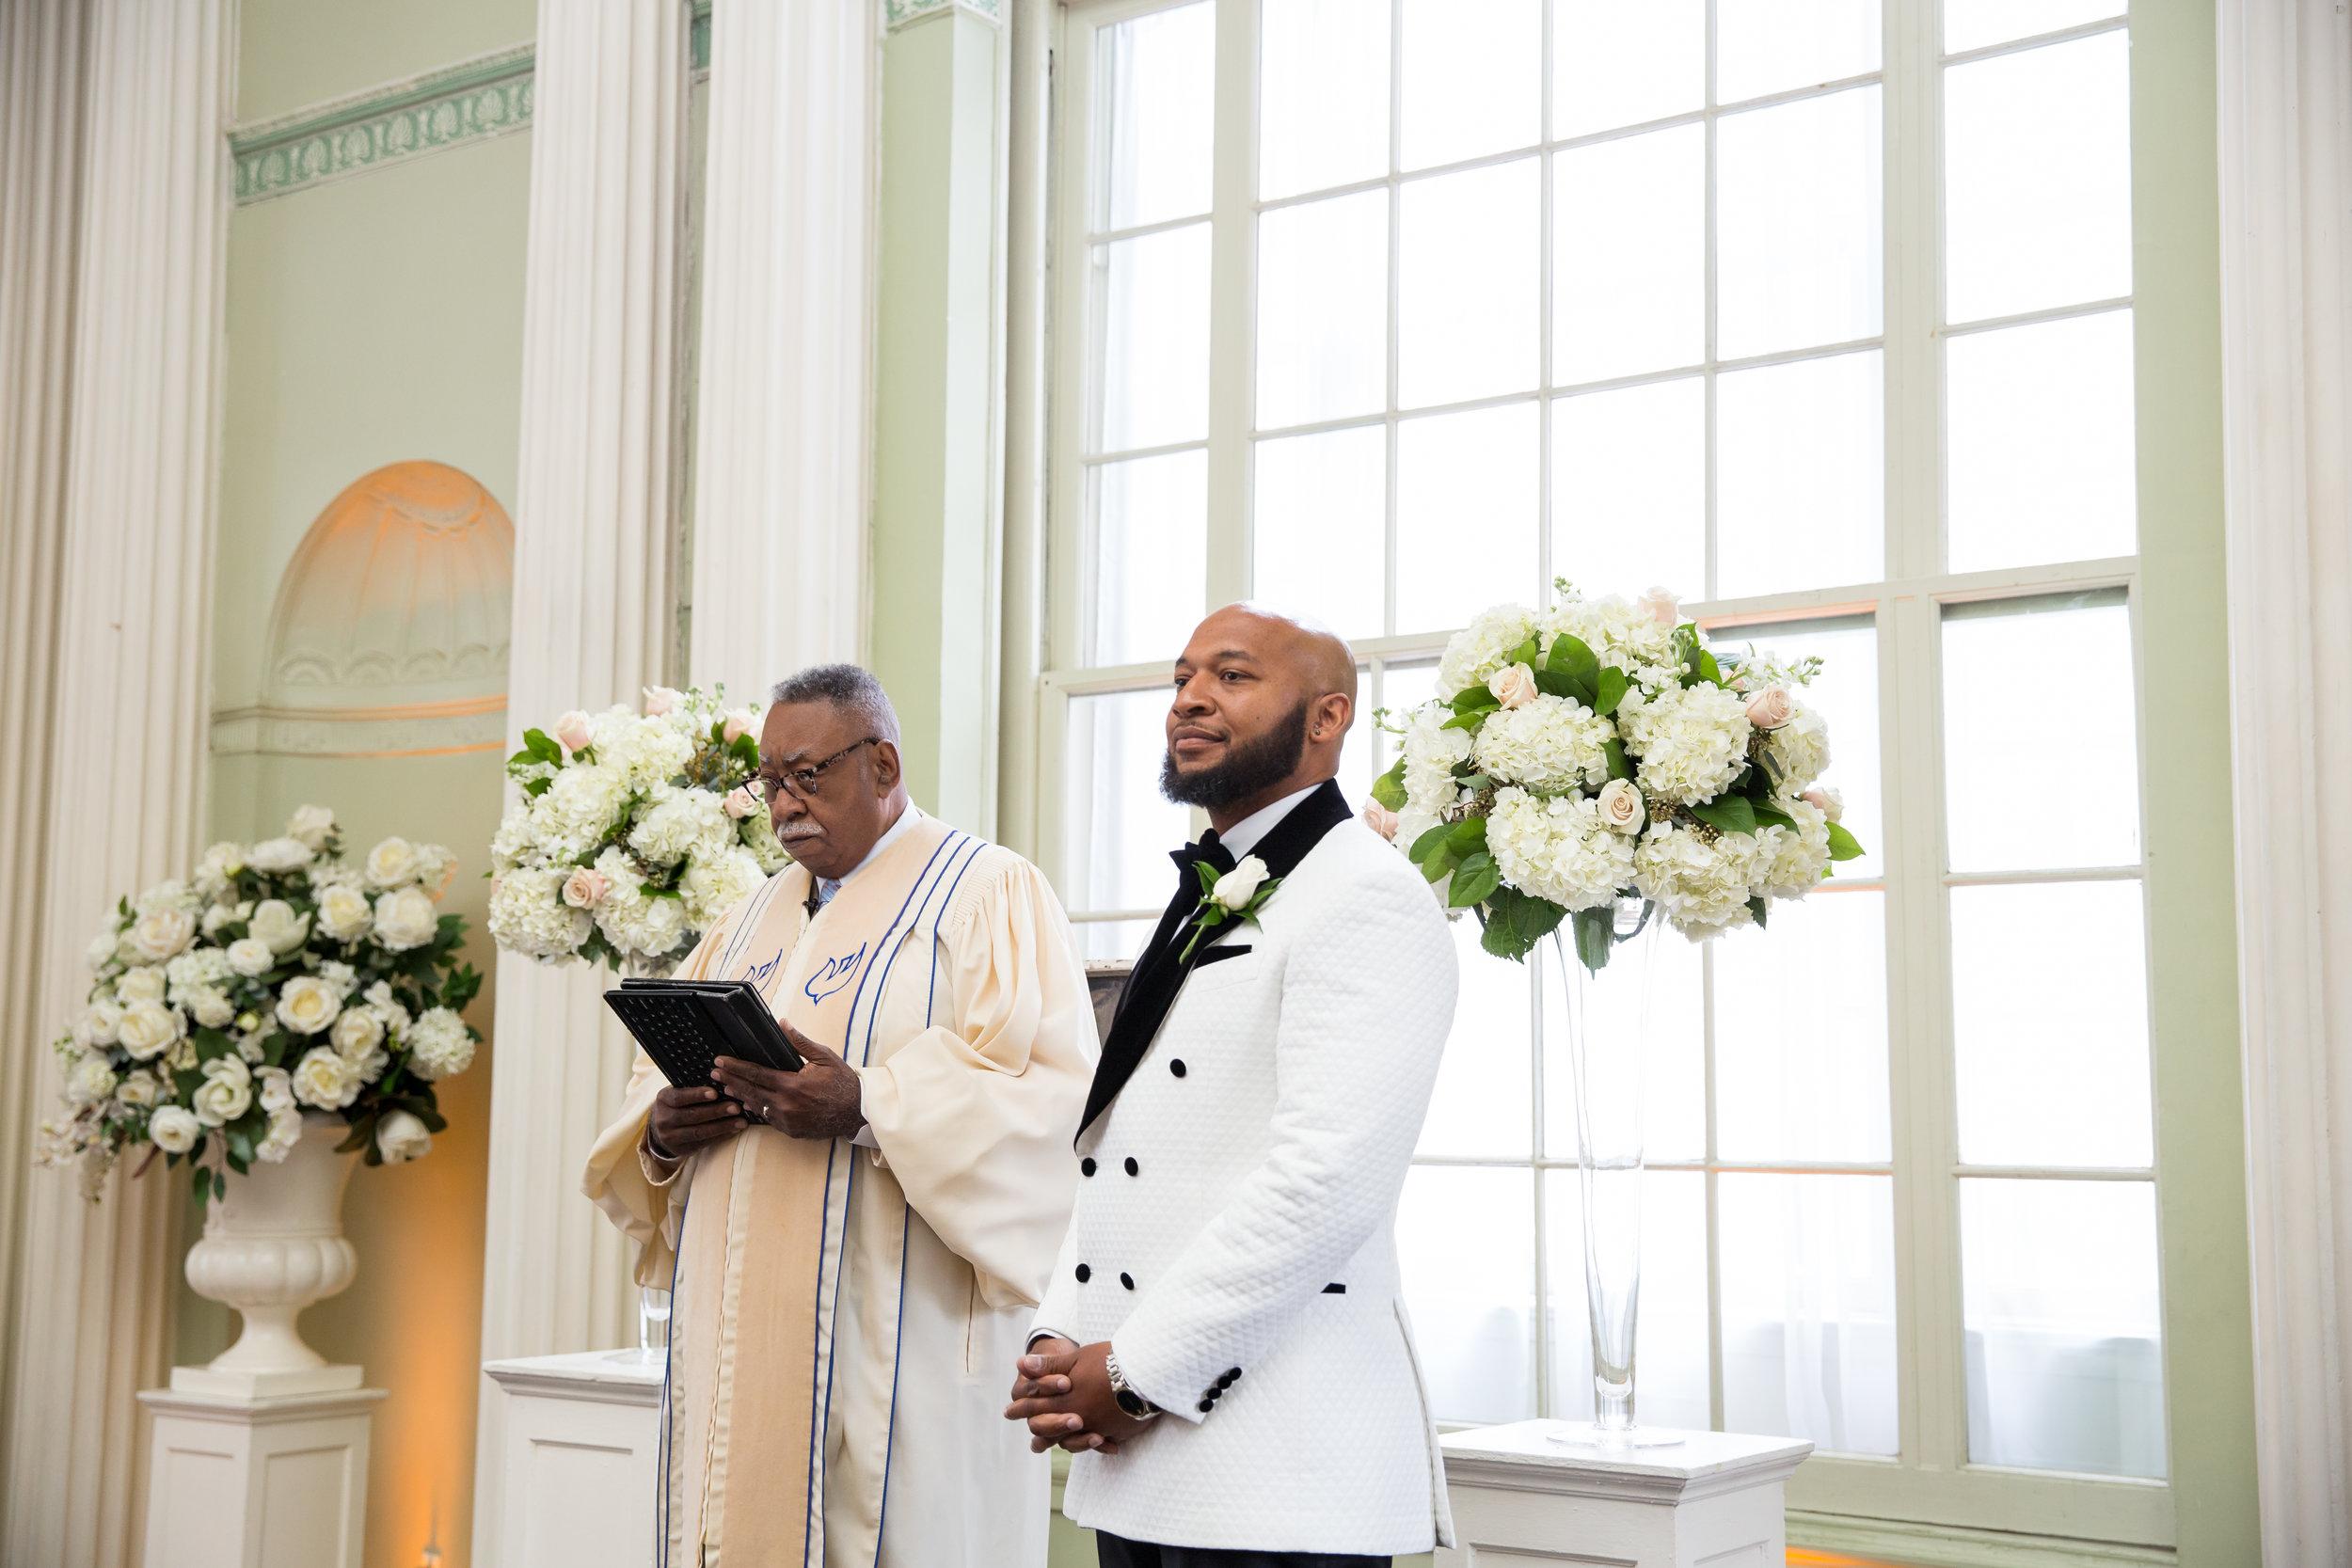 The-Biltmore-Wedding-Rene-Jamison_Cains_Camera_Atlanta_Photography_30.jpg